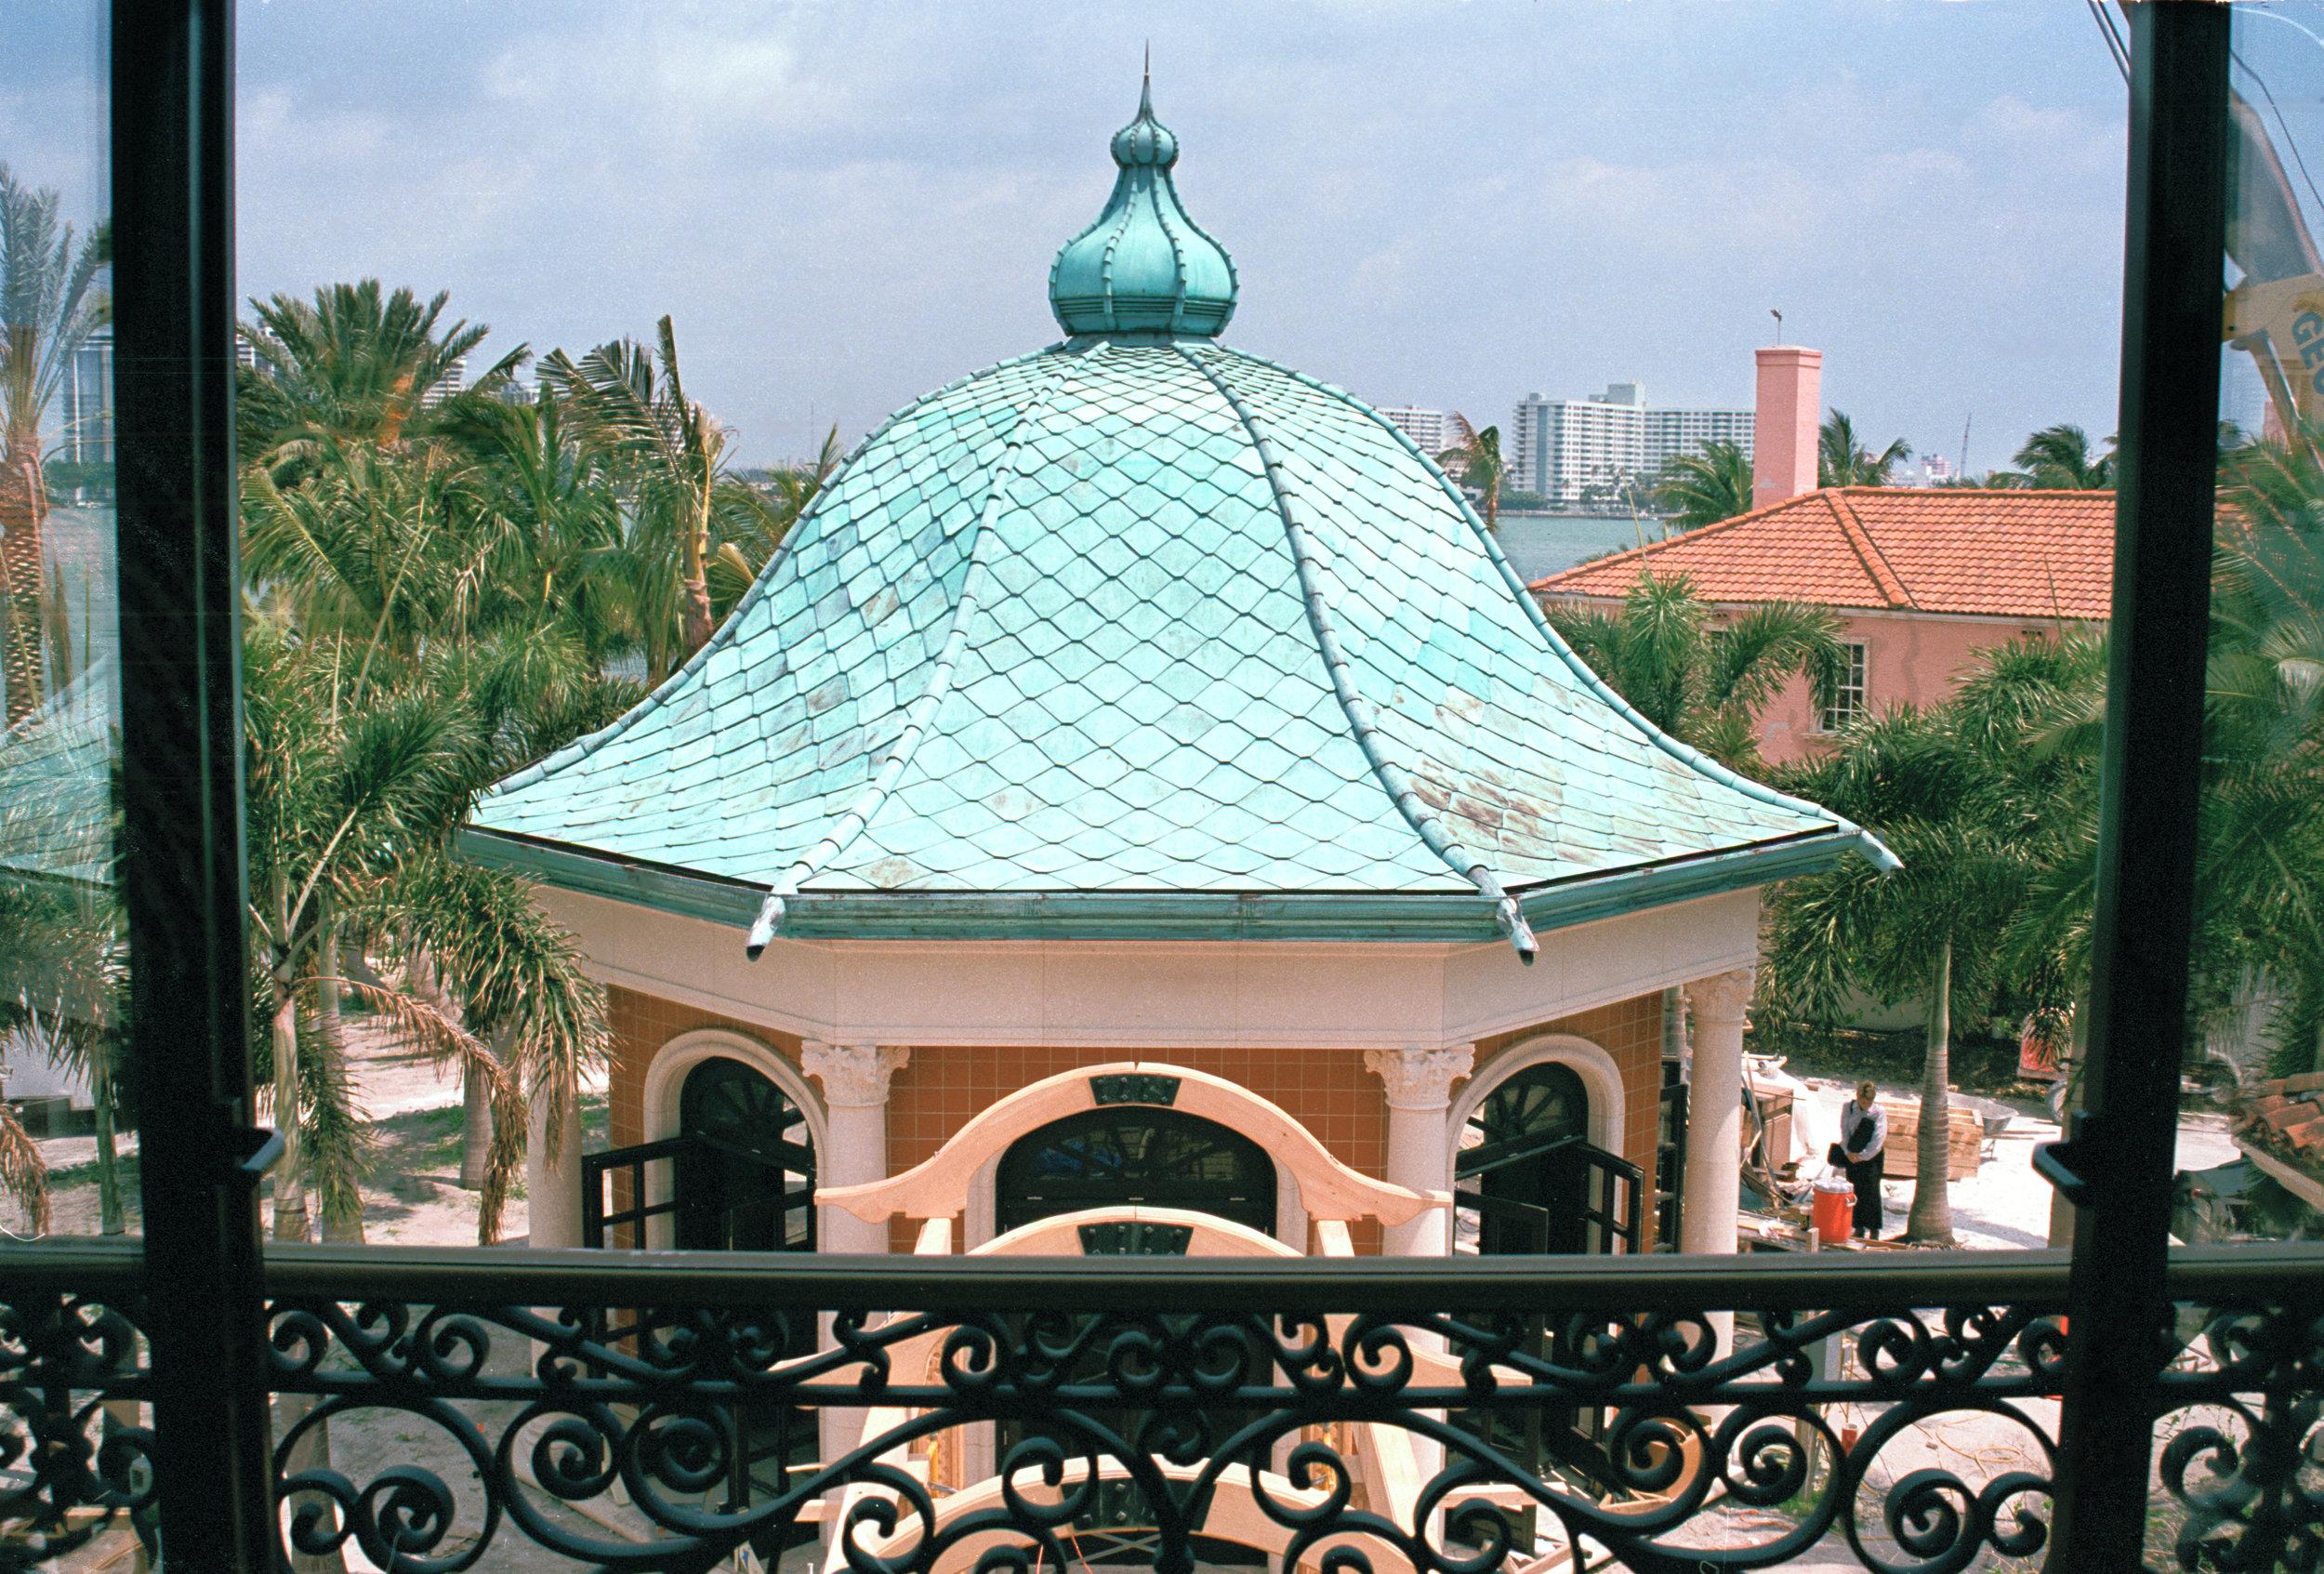 FIRST ABOVE: CIRCULAR CONGREGATIONAL CHURCH, ChARLESTON, SC  SECOND ABOVE: PRIVATE THEATRE, STAR ISLAND, FL